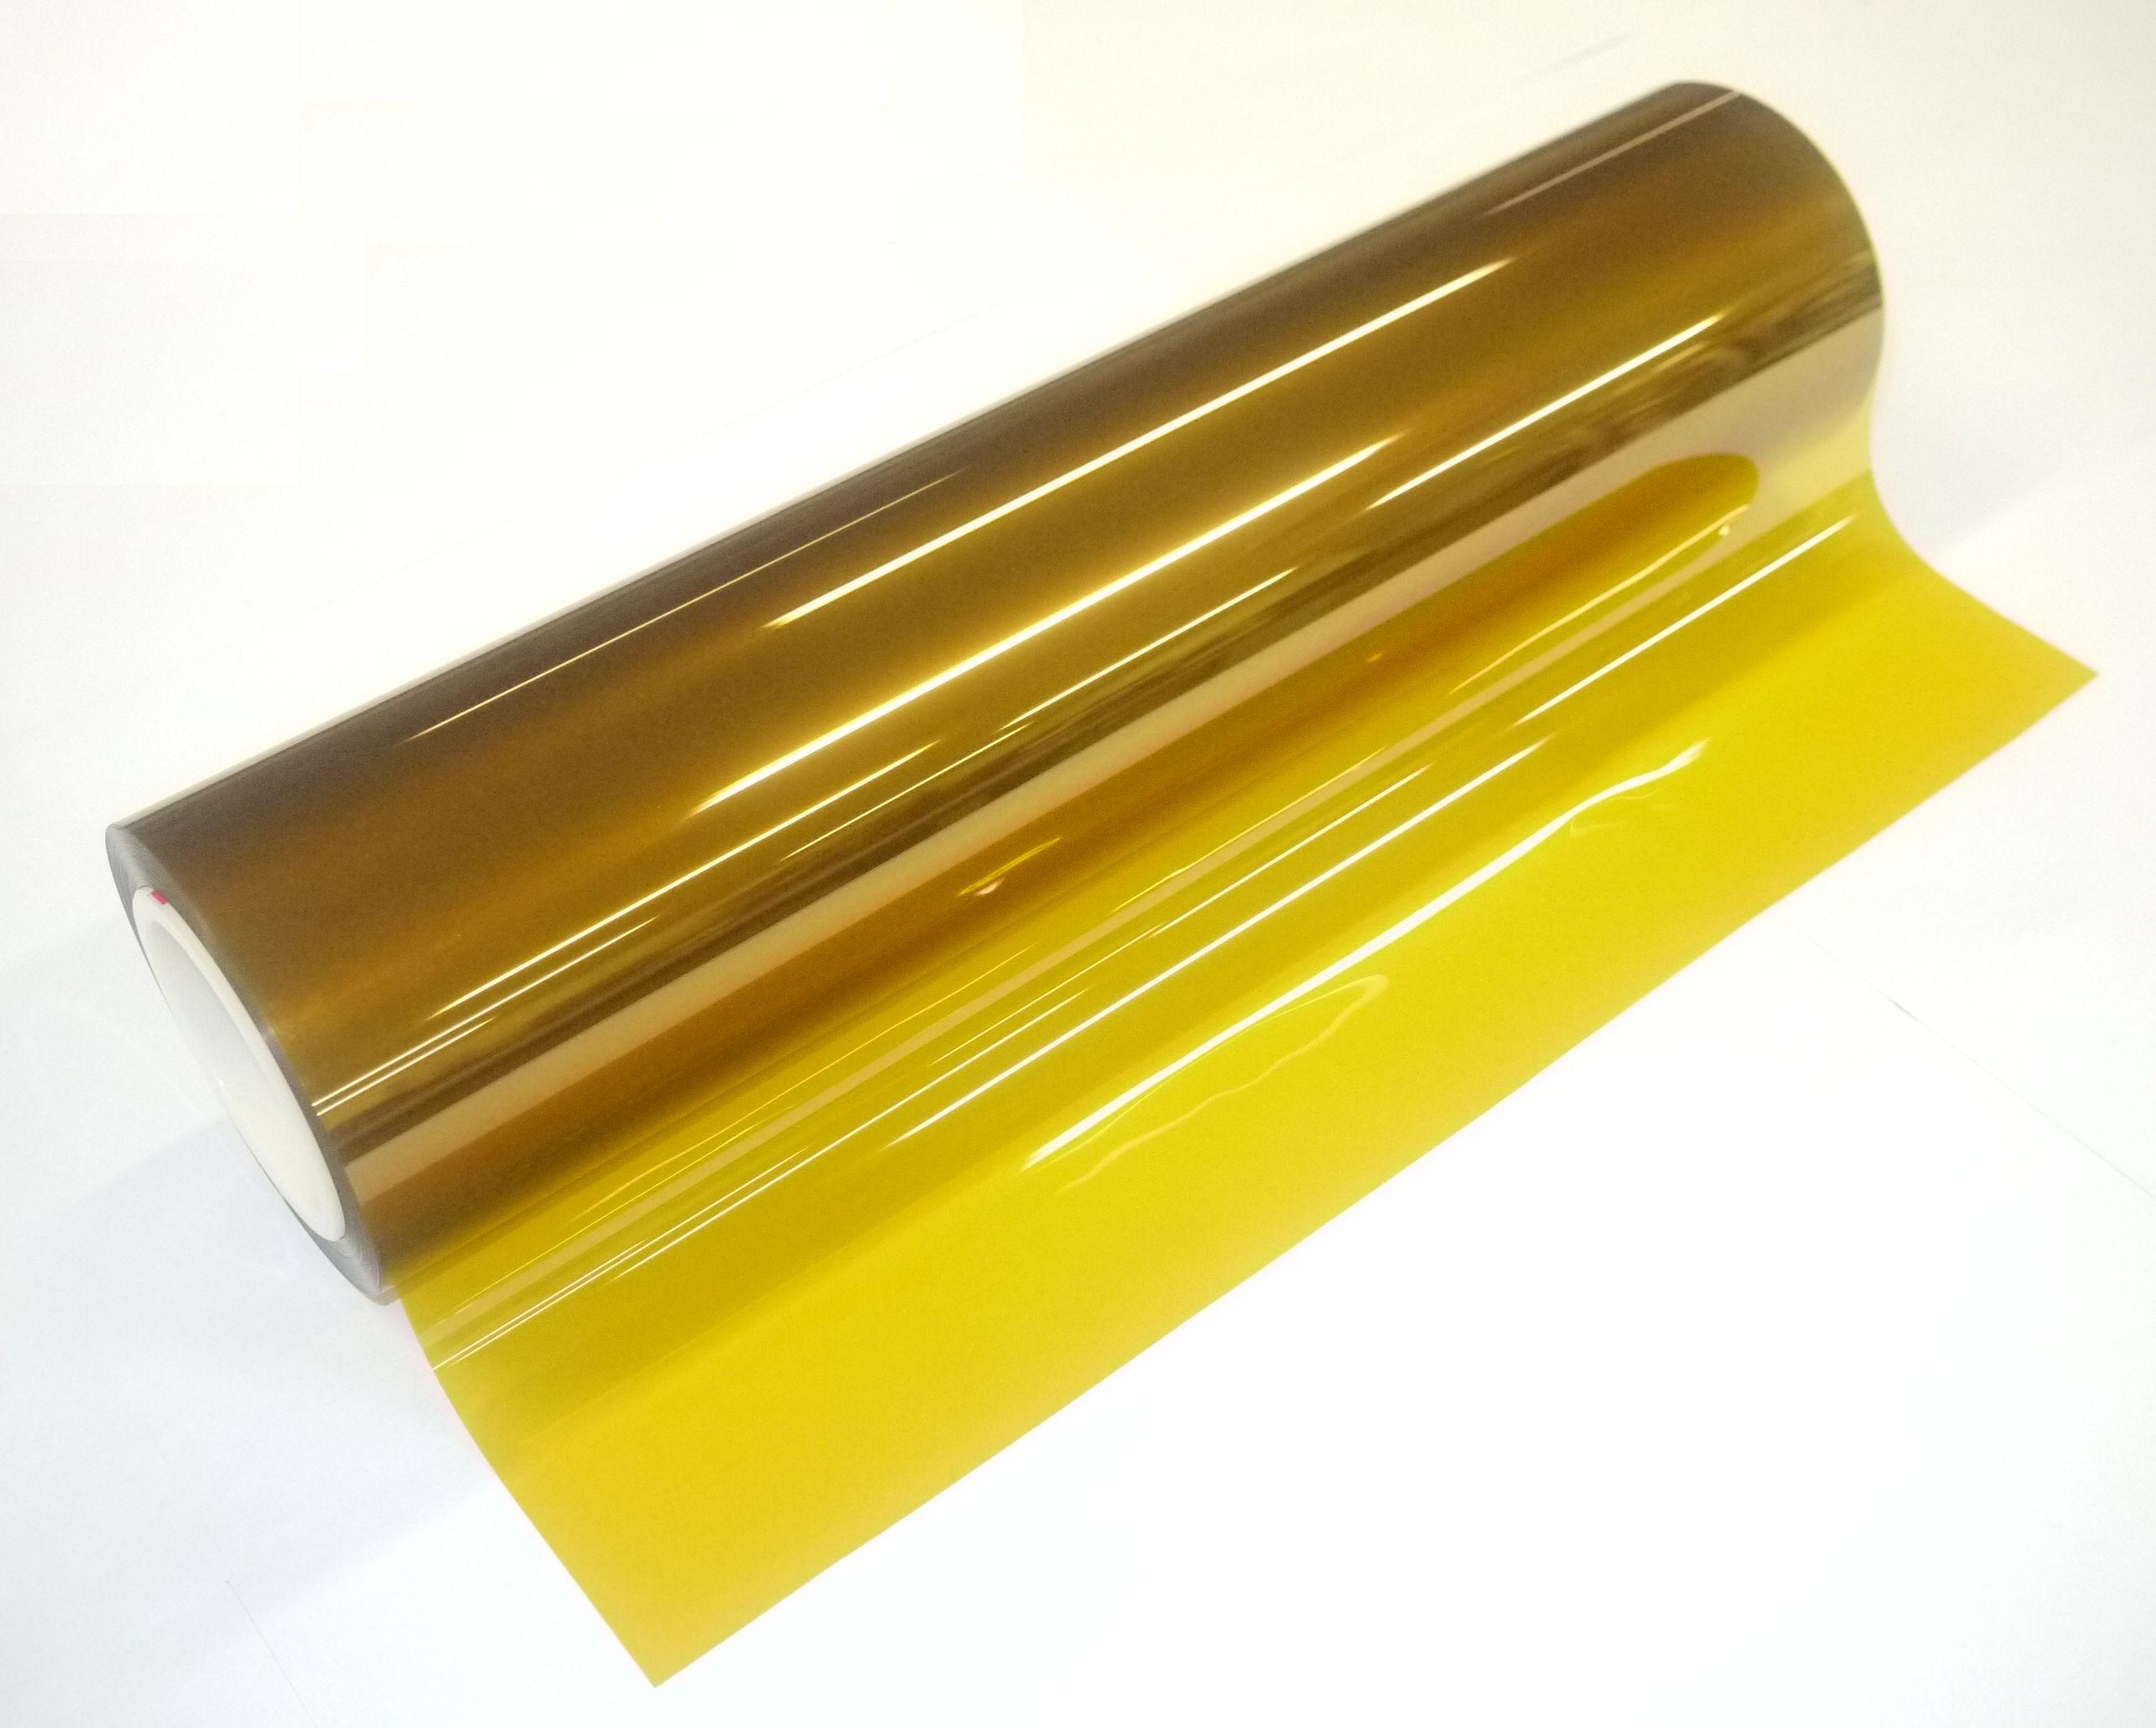 Kapton insulation film